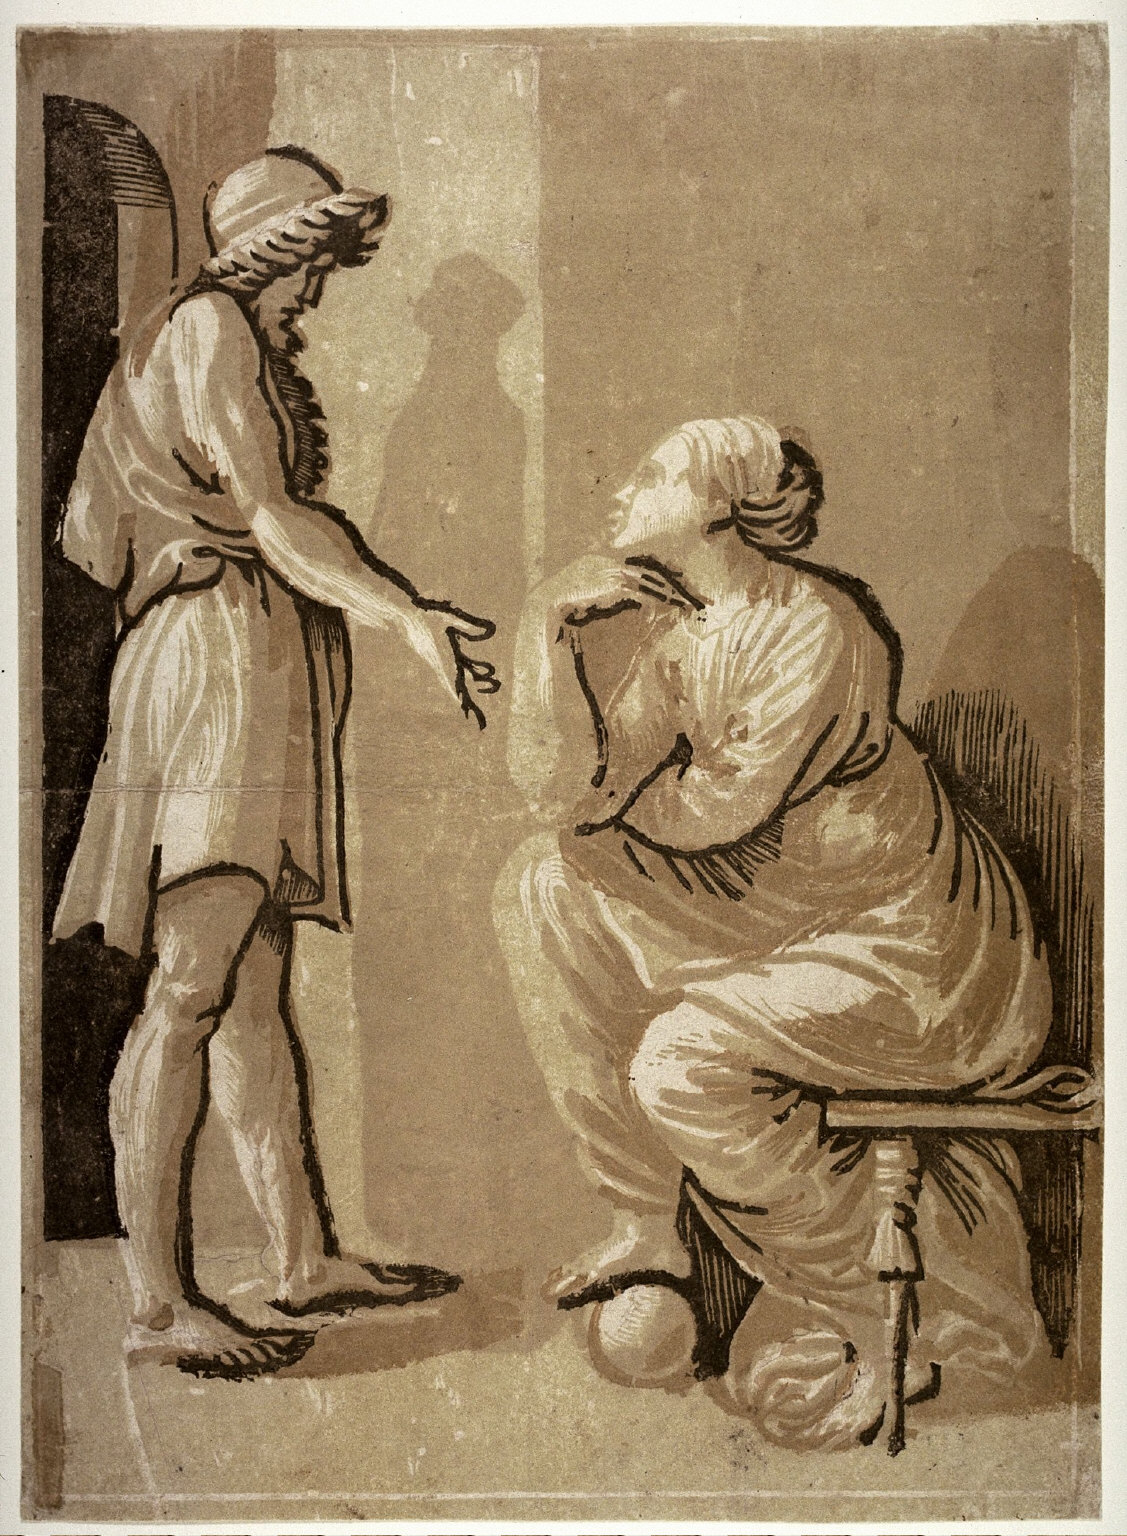 Raphael and his Mistress, after a chiaroscuro woodcut by Ugo da Carpi